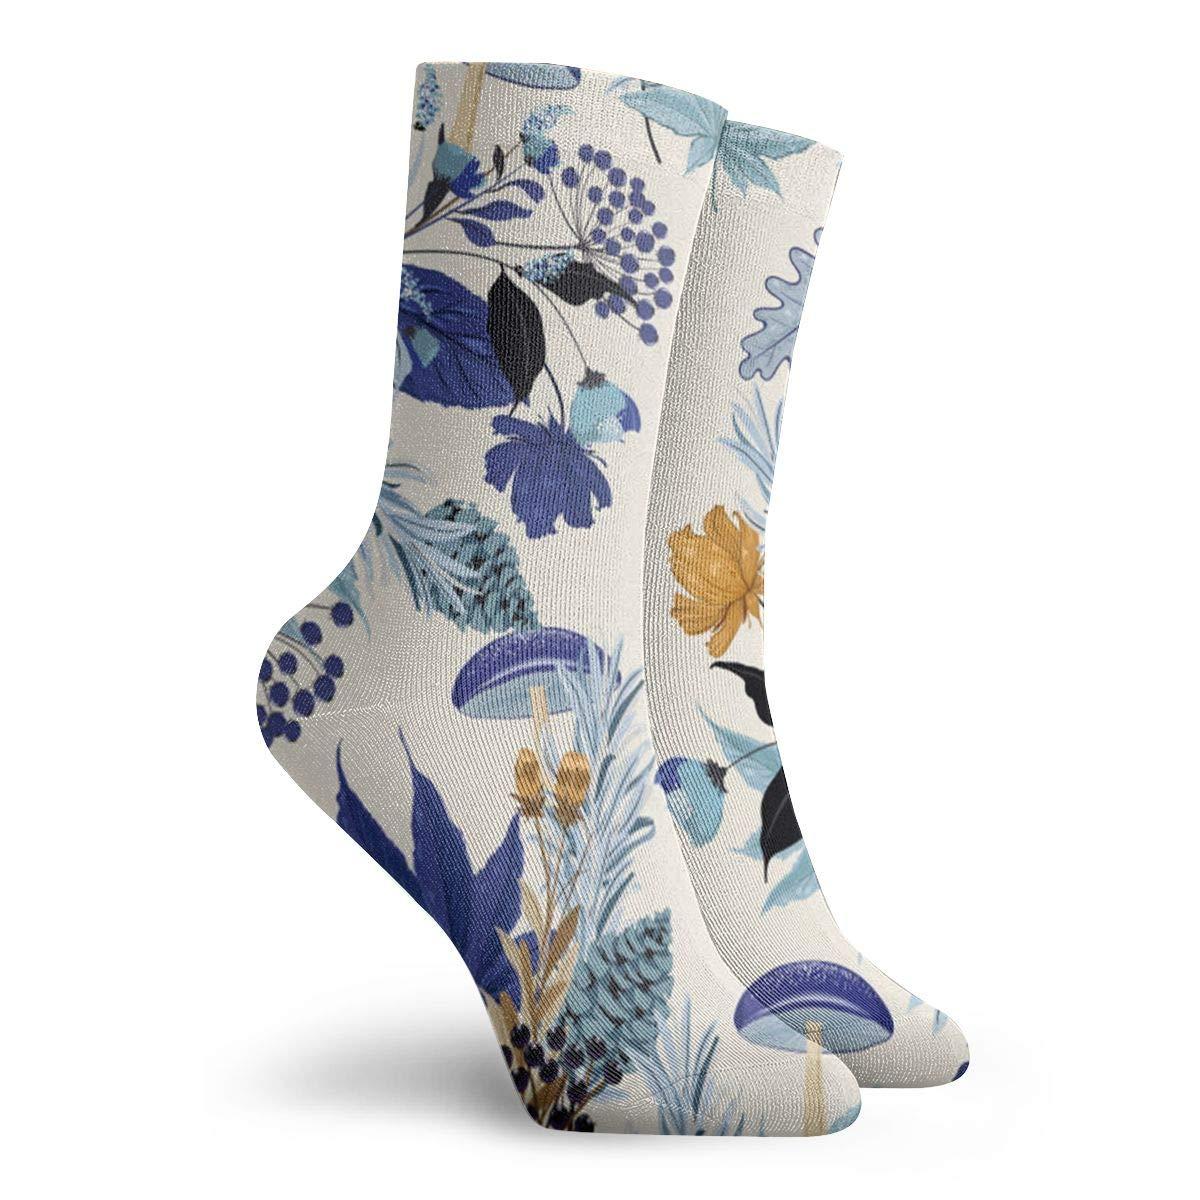 Autumn Garden Unisex Funny Casual Crew Socks Athletic Socks For Boys Girls Kids Teenagers